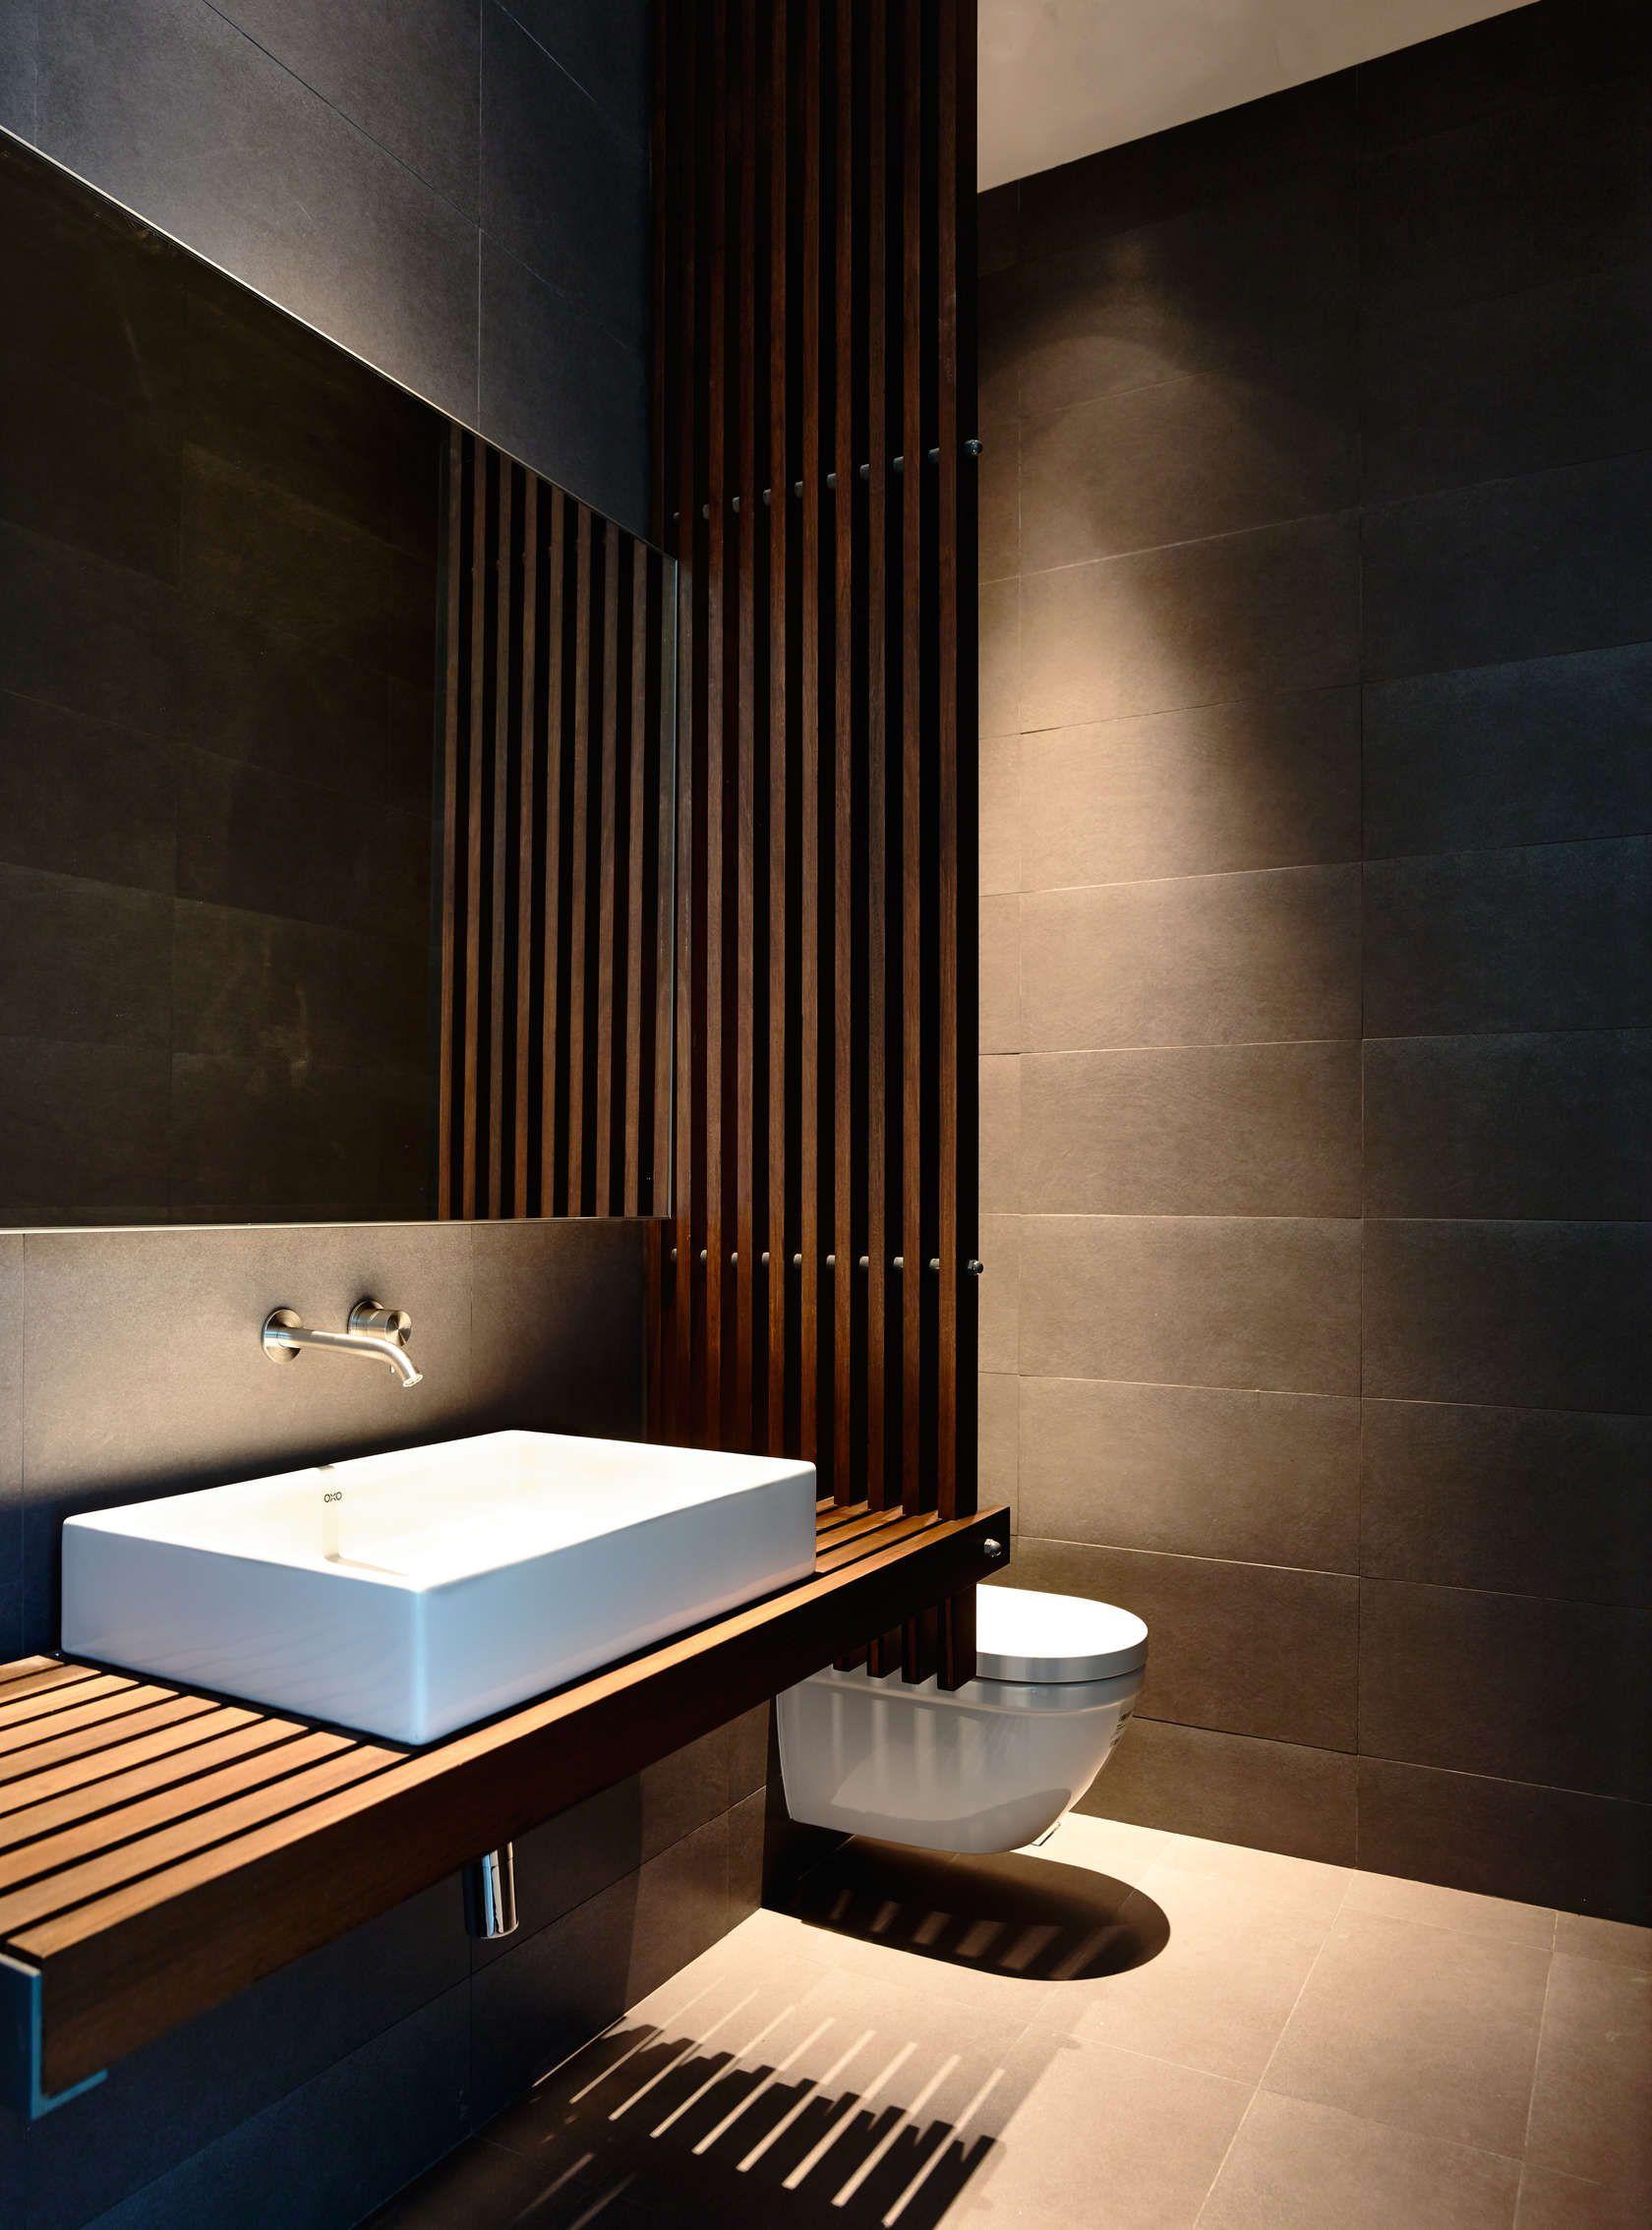 Like The Use Of Vertical Wood Slats To Create Privacy Bathroom Design Modern Bathroom Bathroom Interior Design